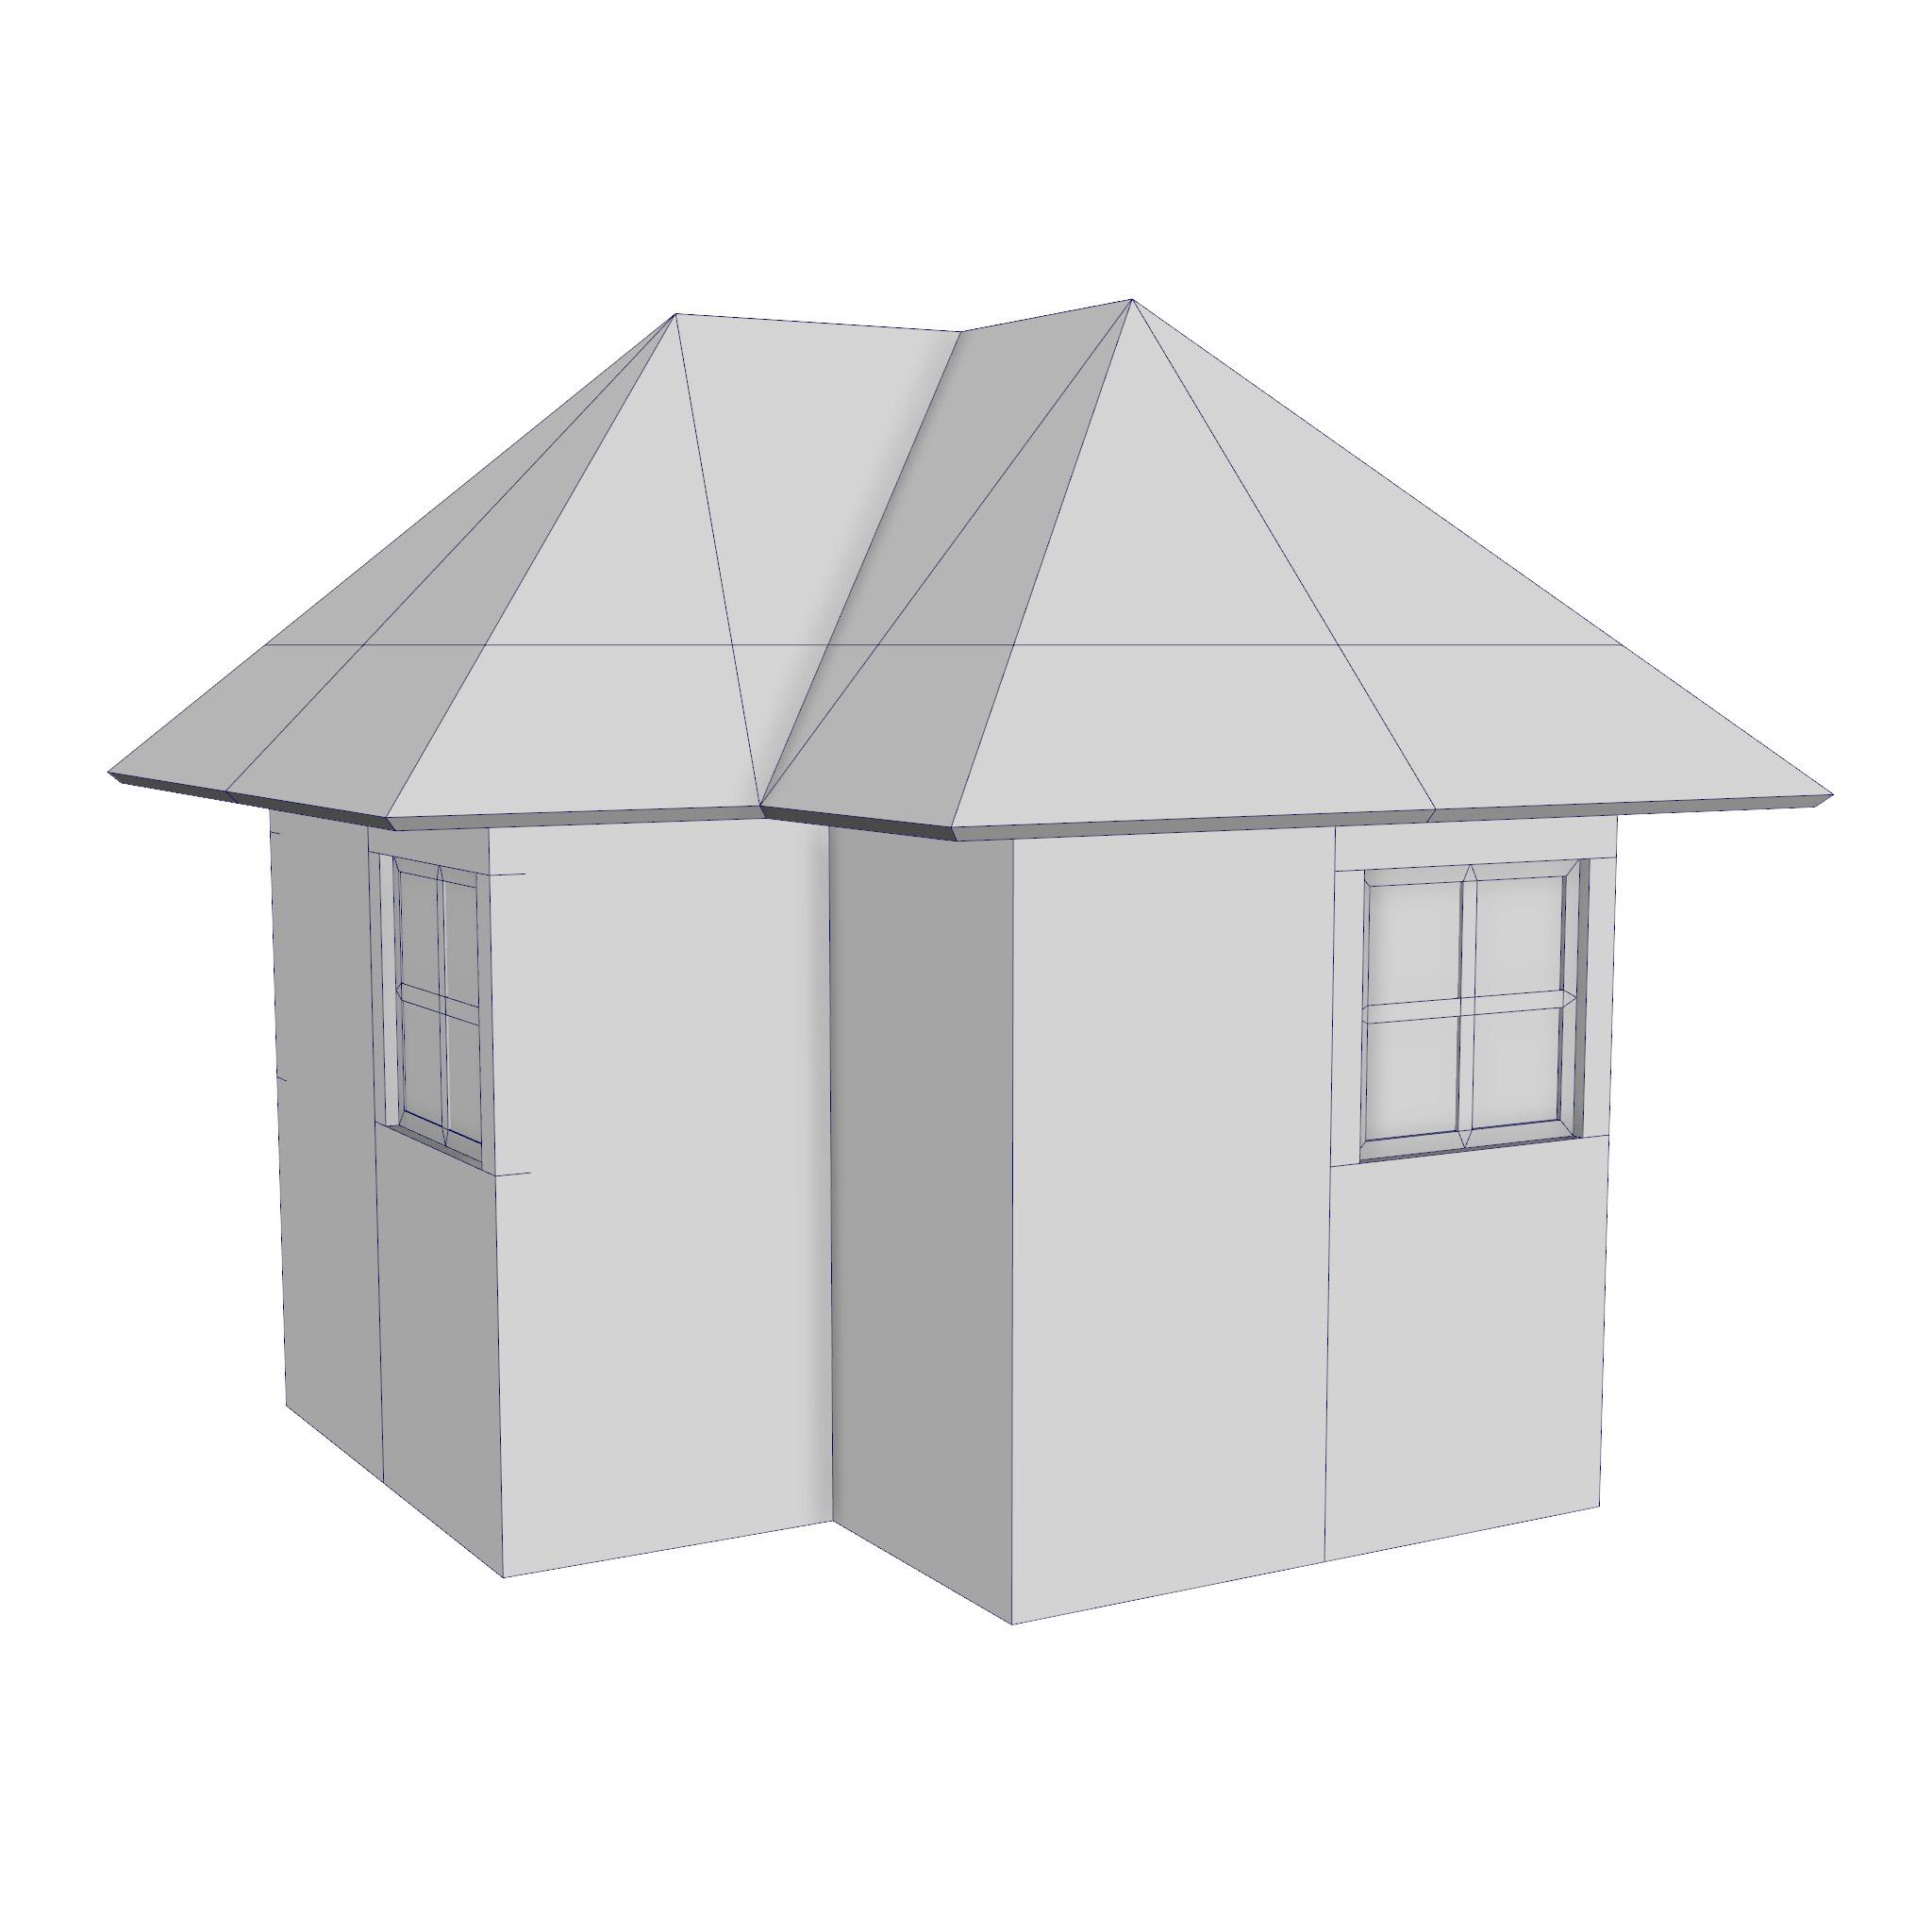 modular brick house set 3d model fbx ma mb 271409